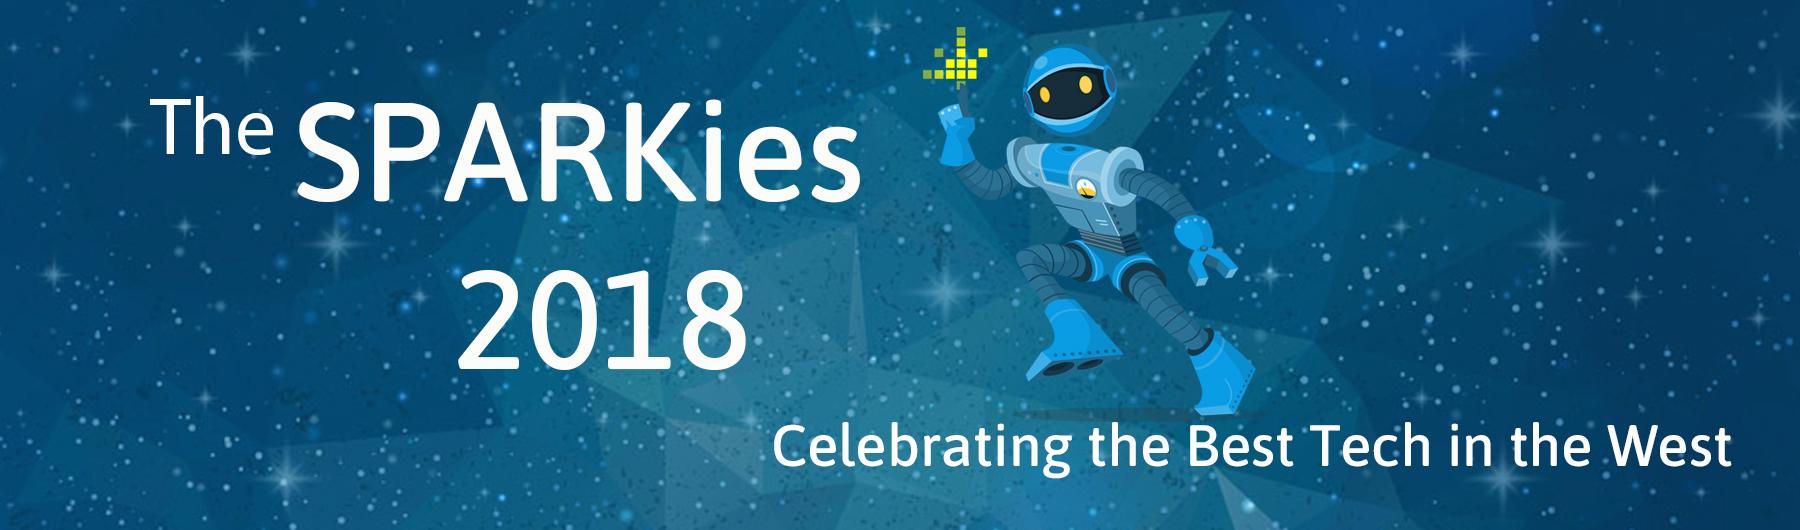 The SPARKies 2018